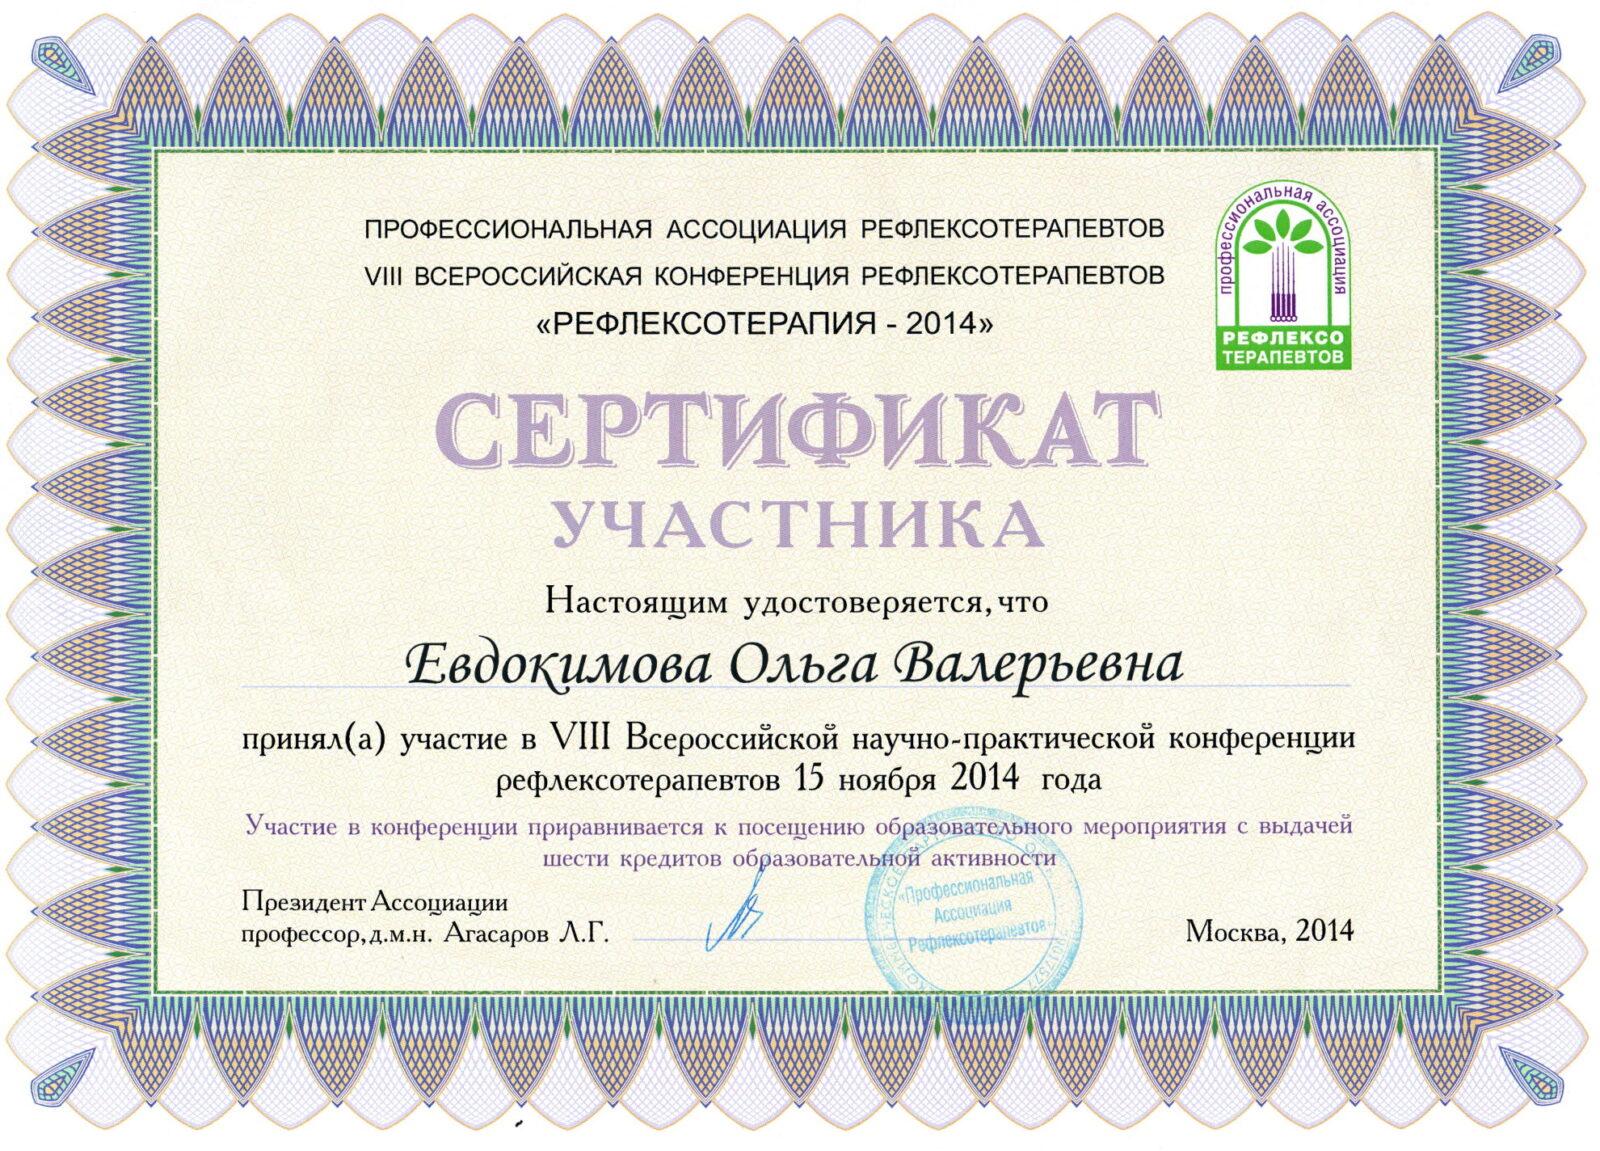 2014.11.15 Сертификат